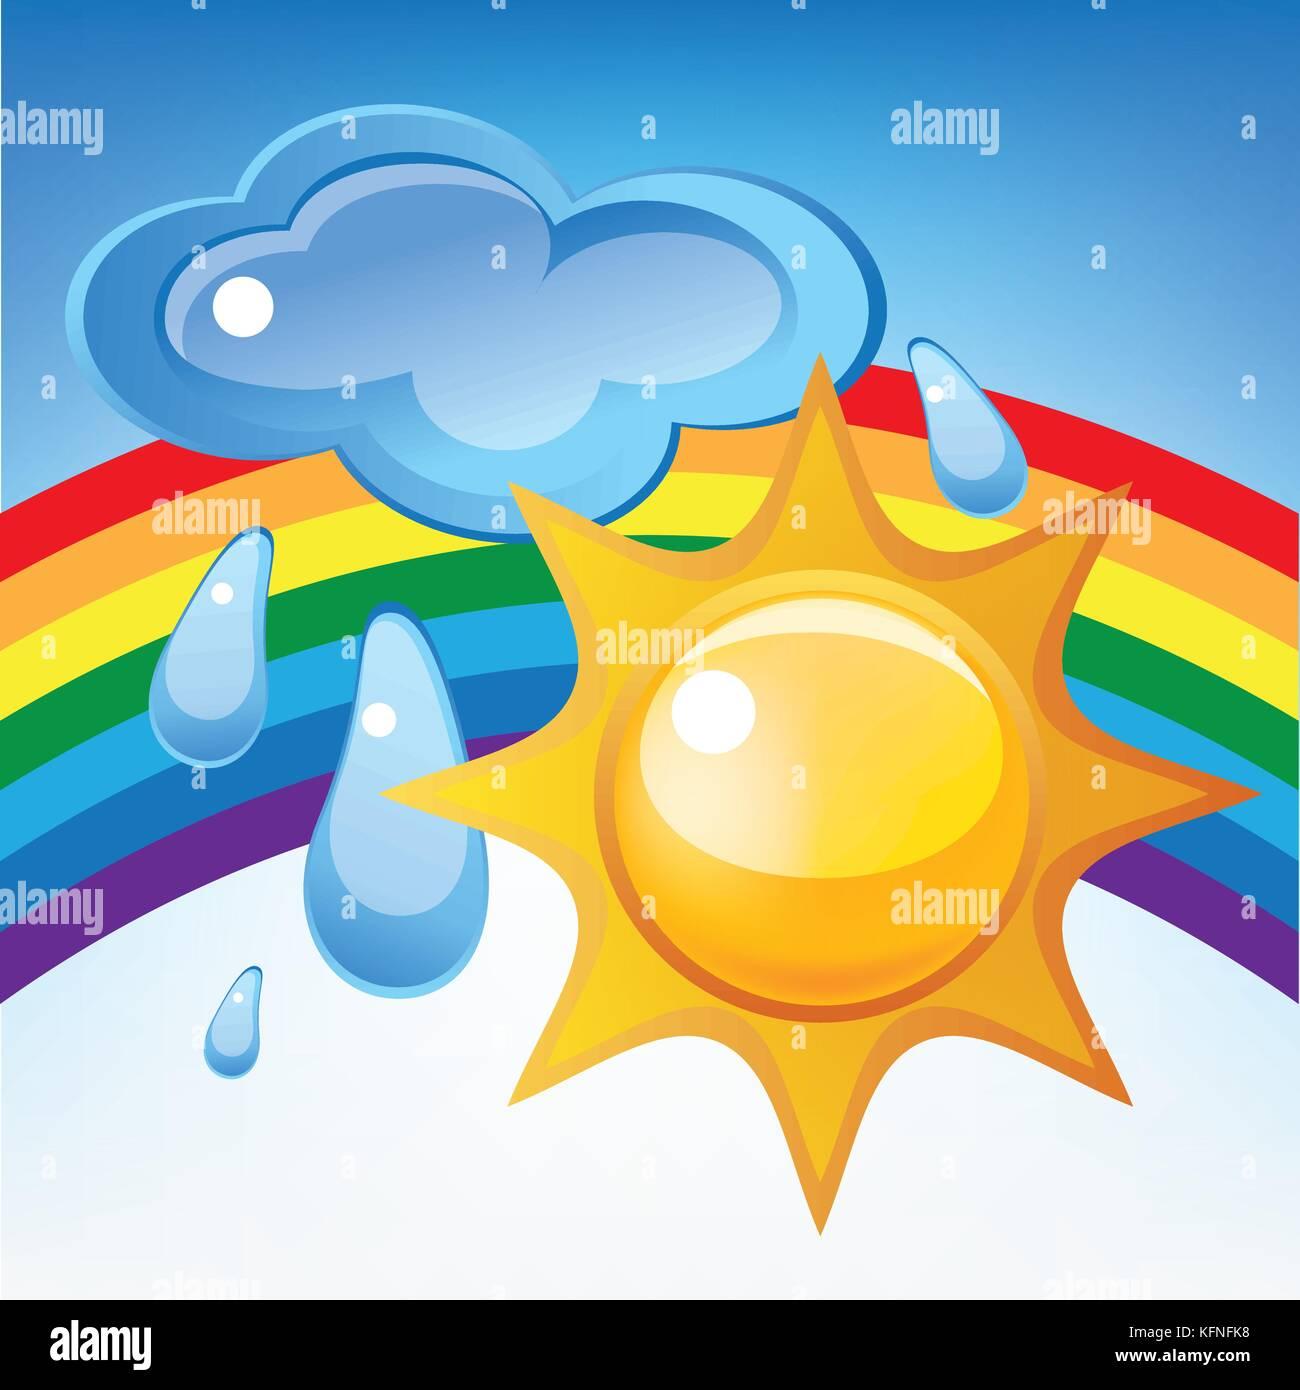 Sun, cloud, rain and rainbow - Stock Image